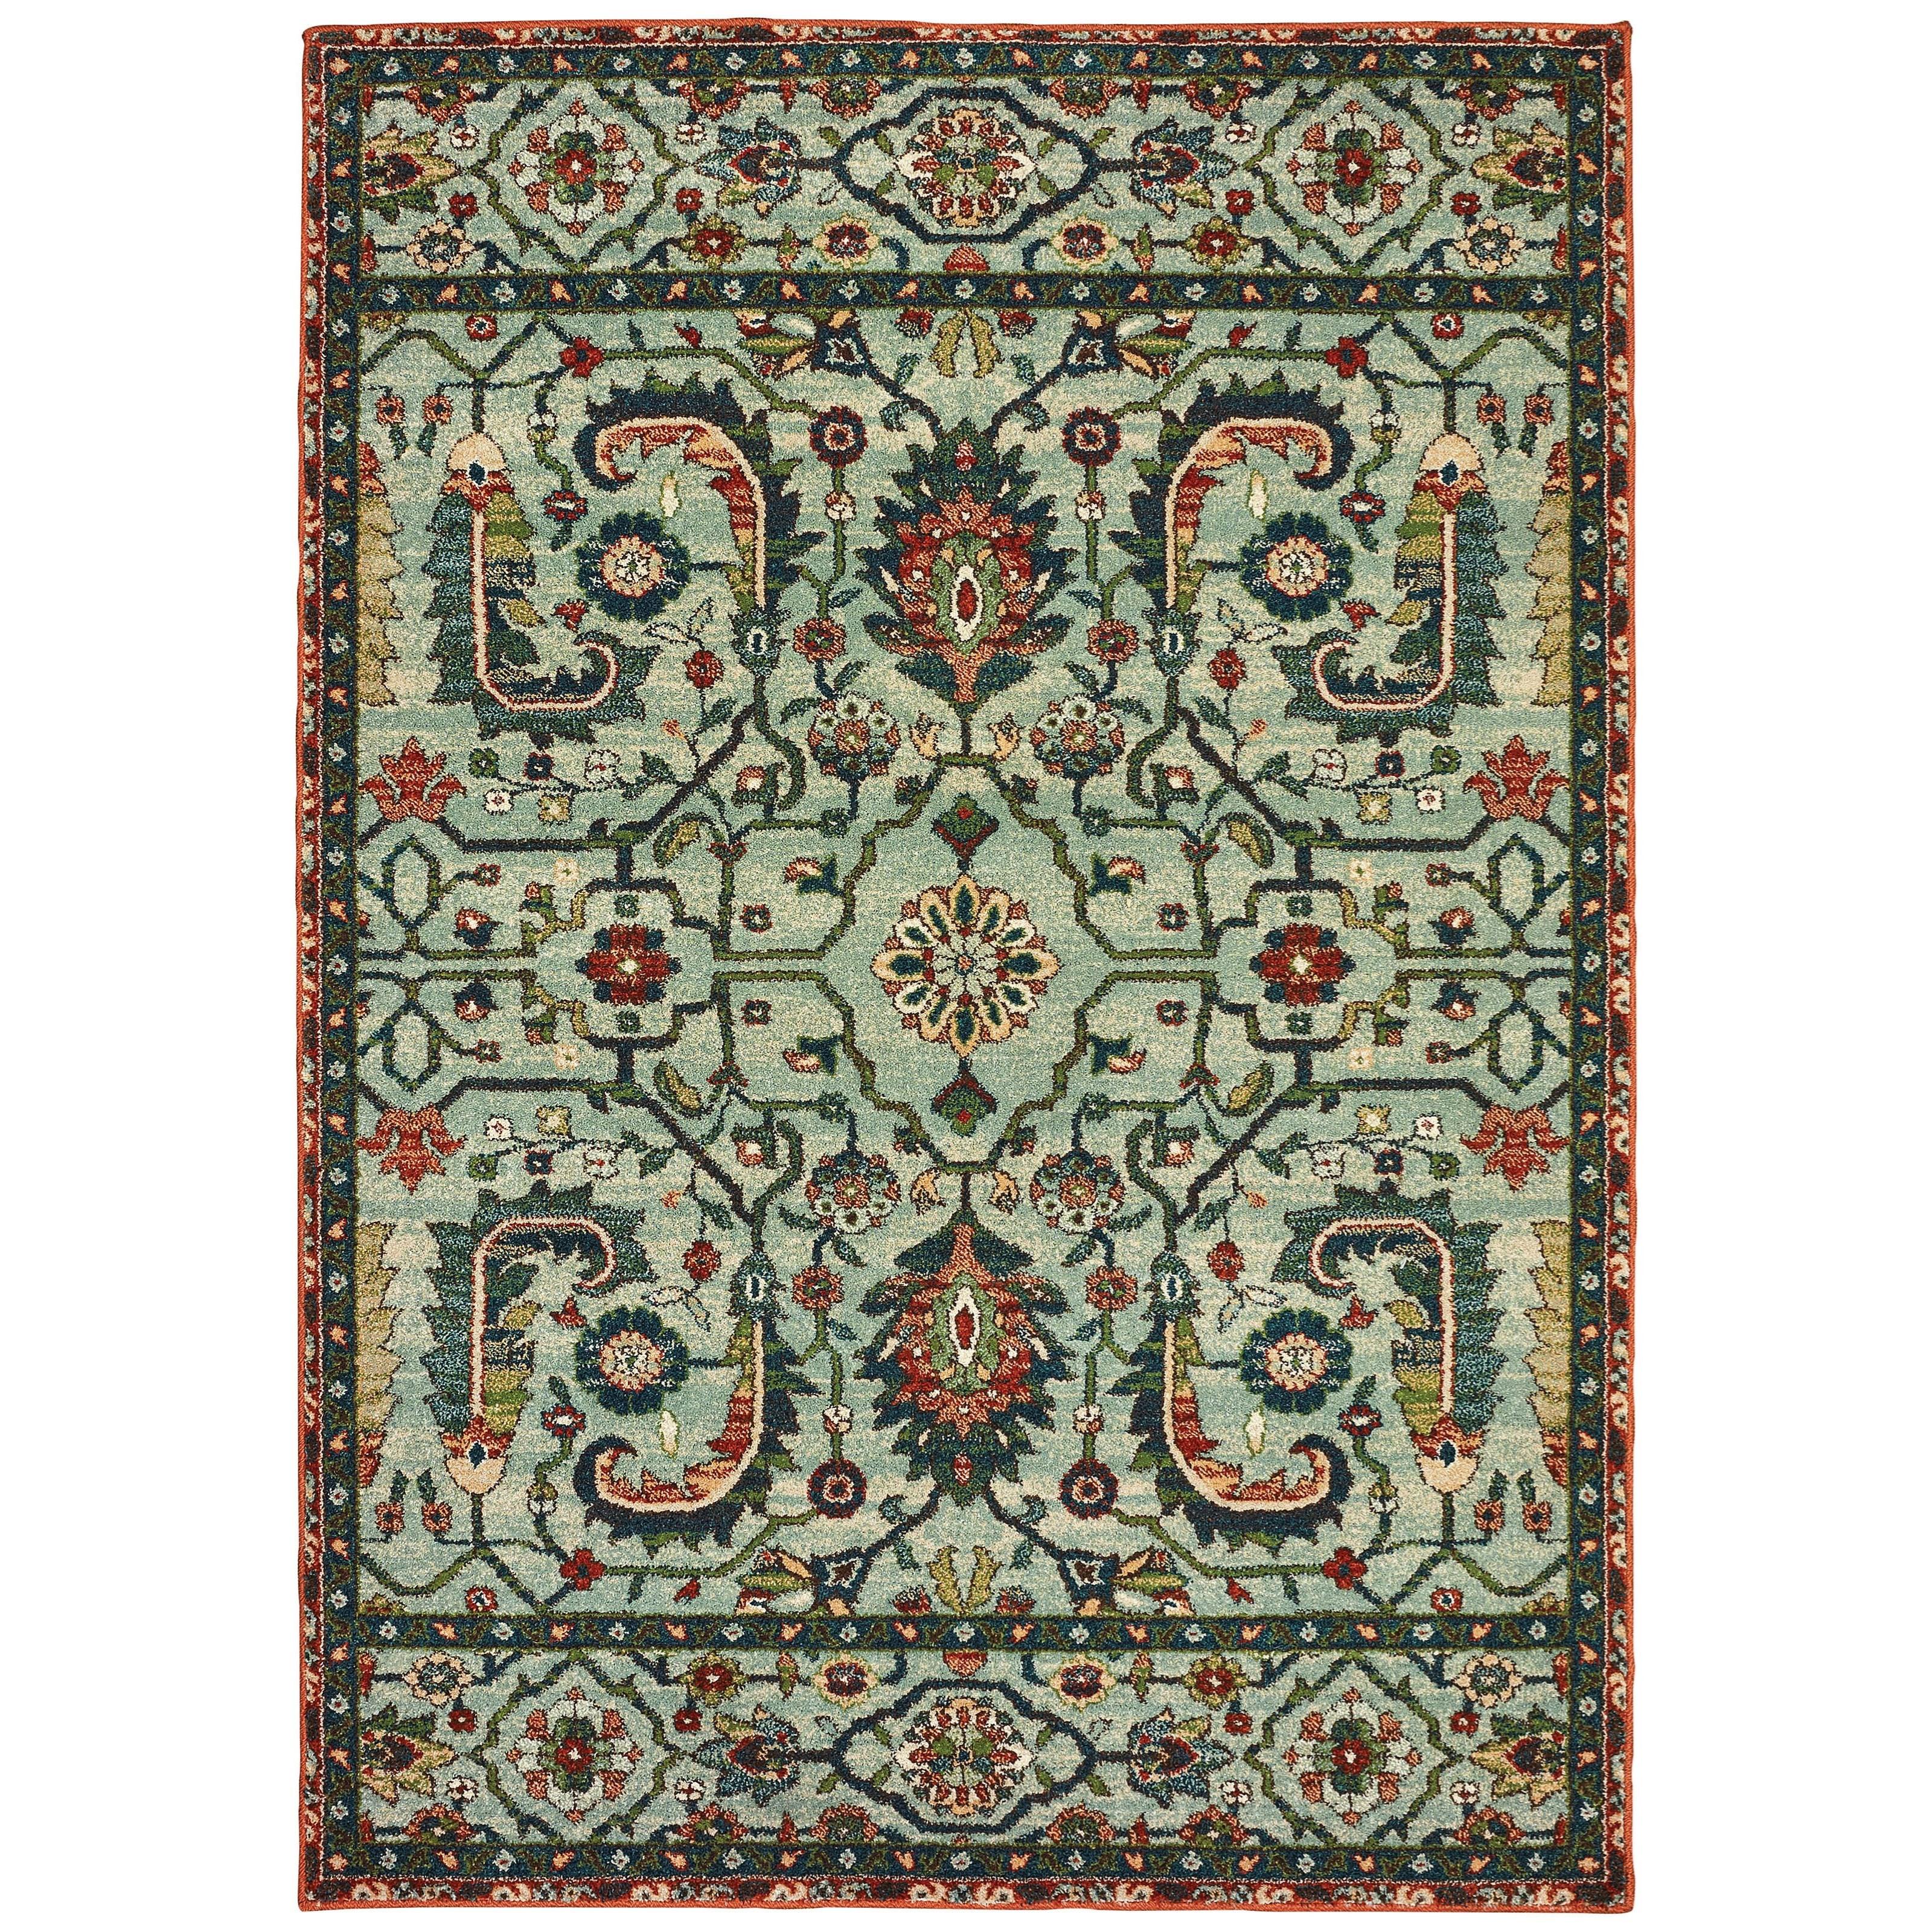 "Dawson 7'10"" X 10'10"" Rectangle Rug by Oriental Weavers at Lucas Furniture & Mattress"